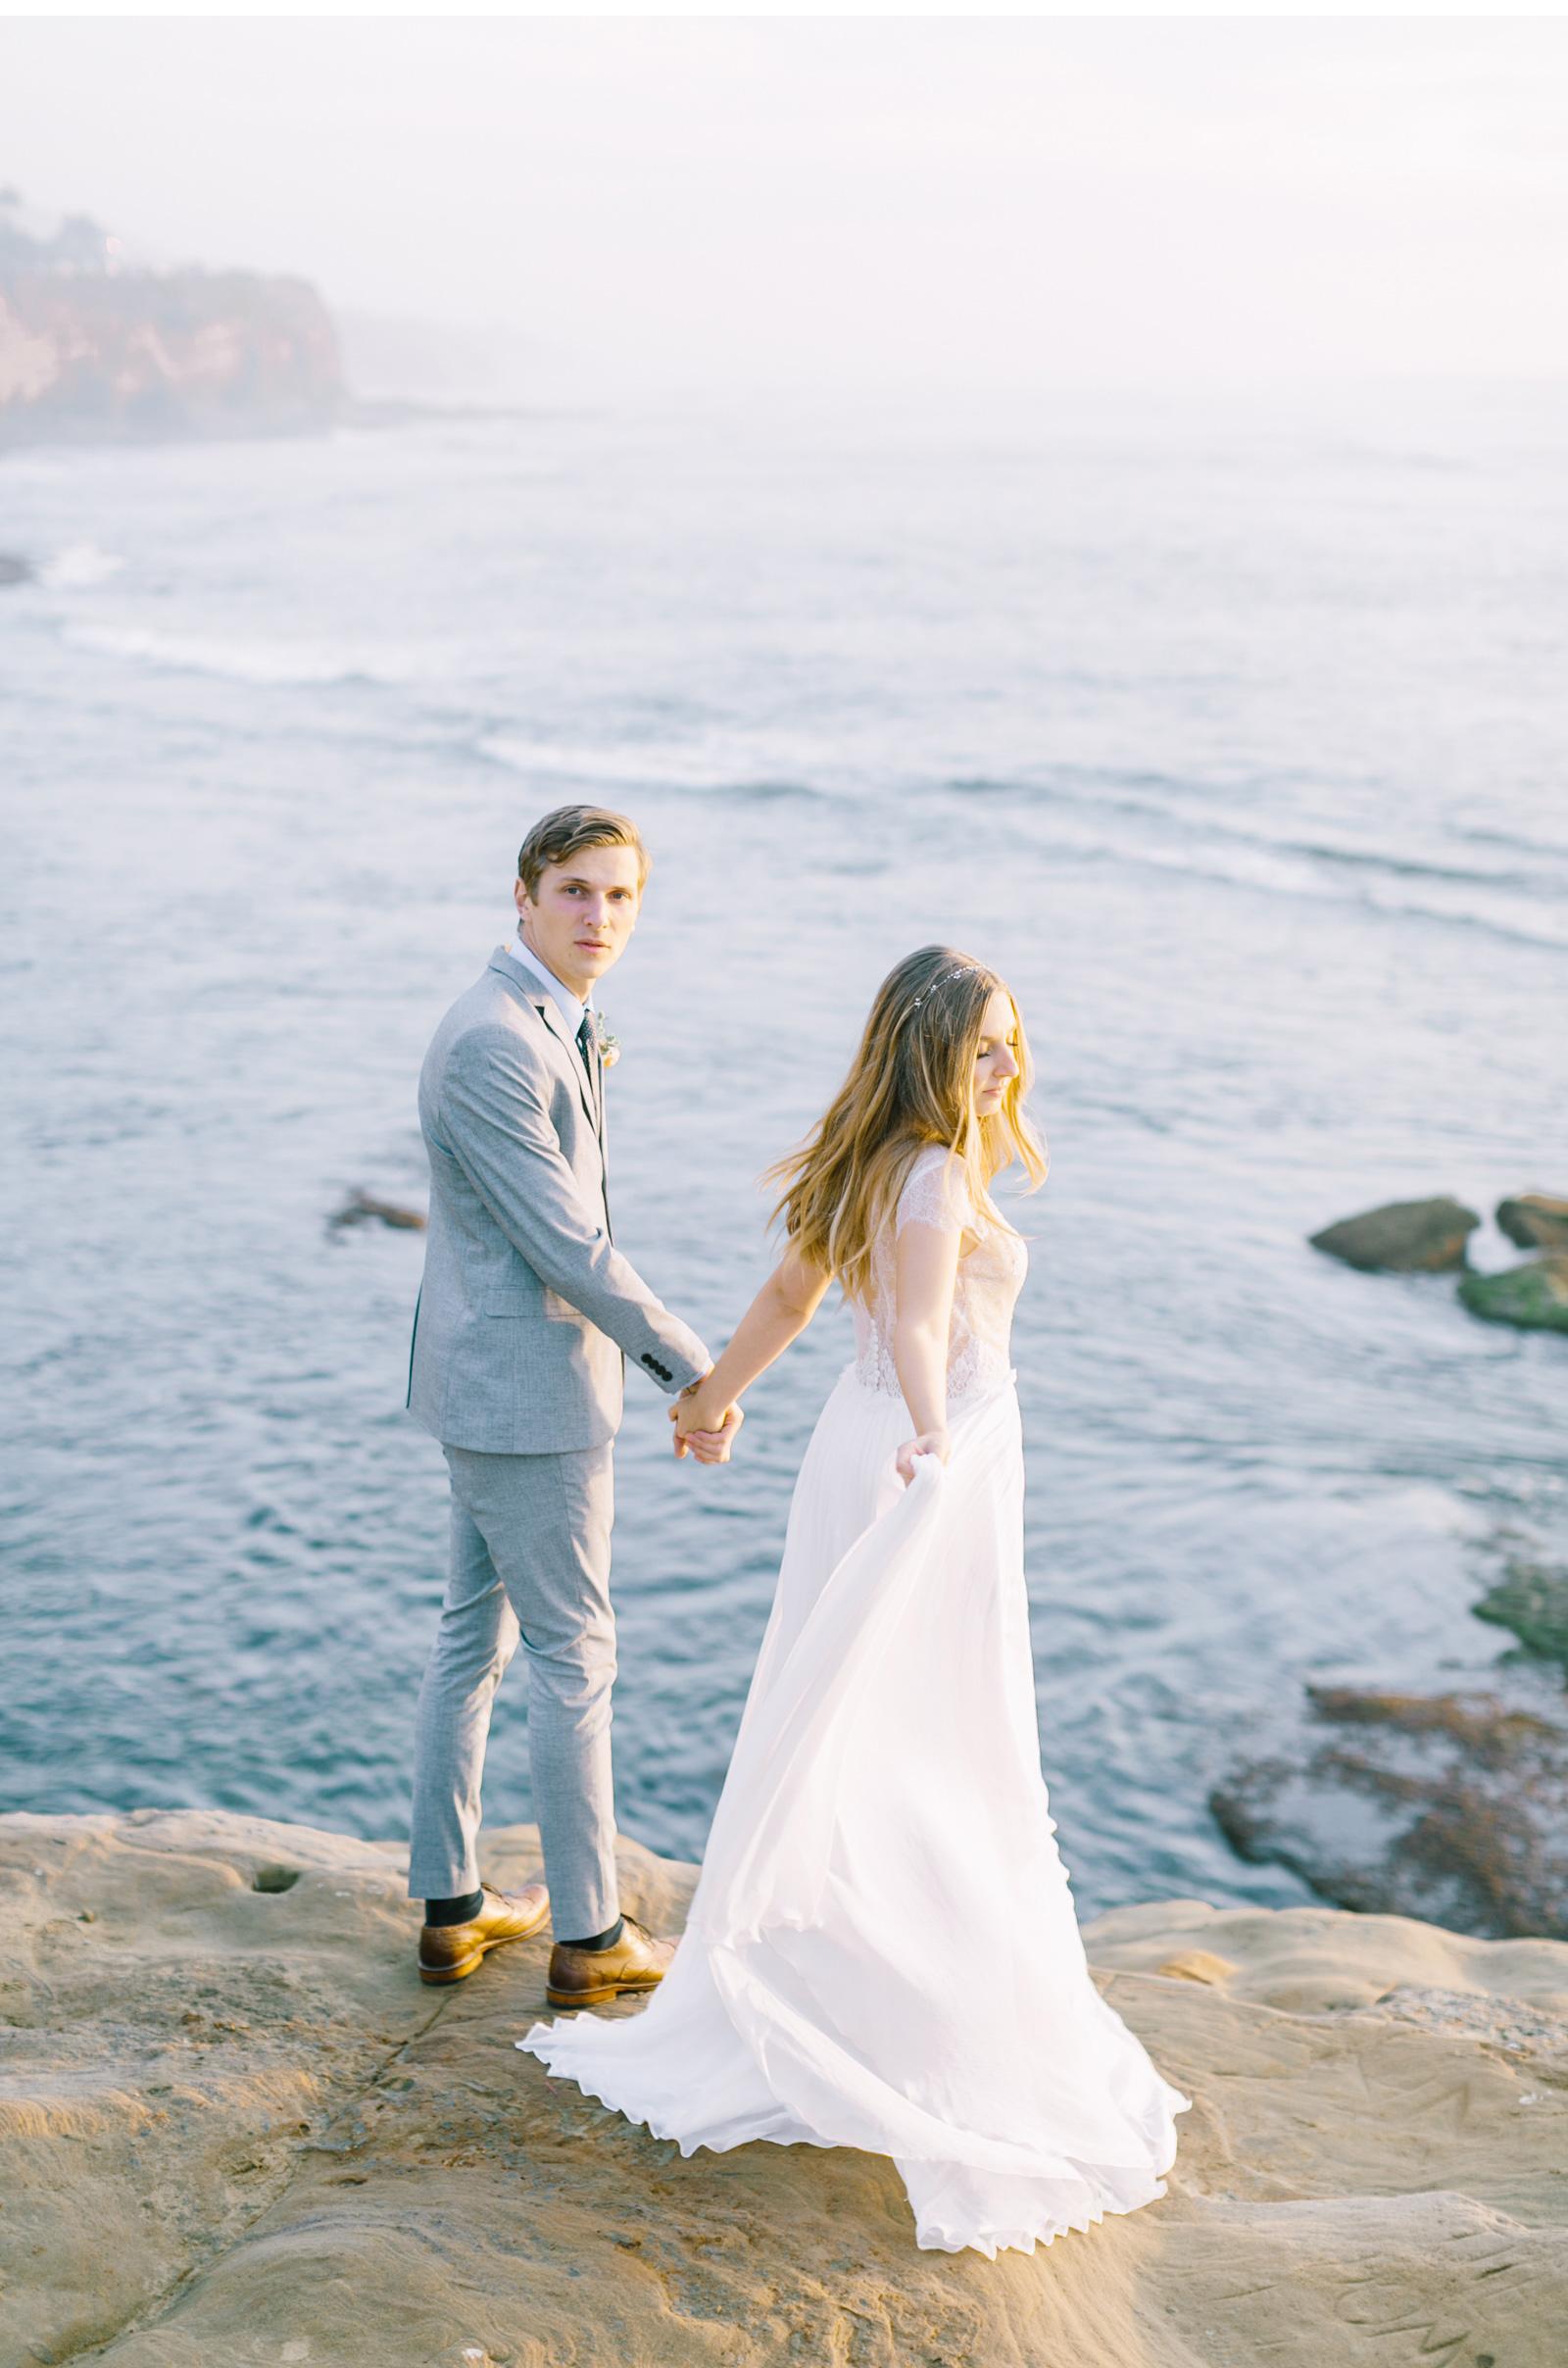 Hawaii-Fine-Art-Wedding-Photographer-Natalie-Schutt-Photography-Style-Me-Pretty_12.jpg